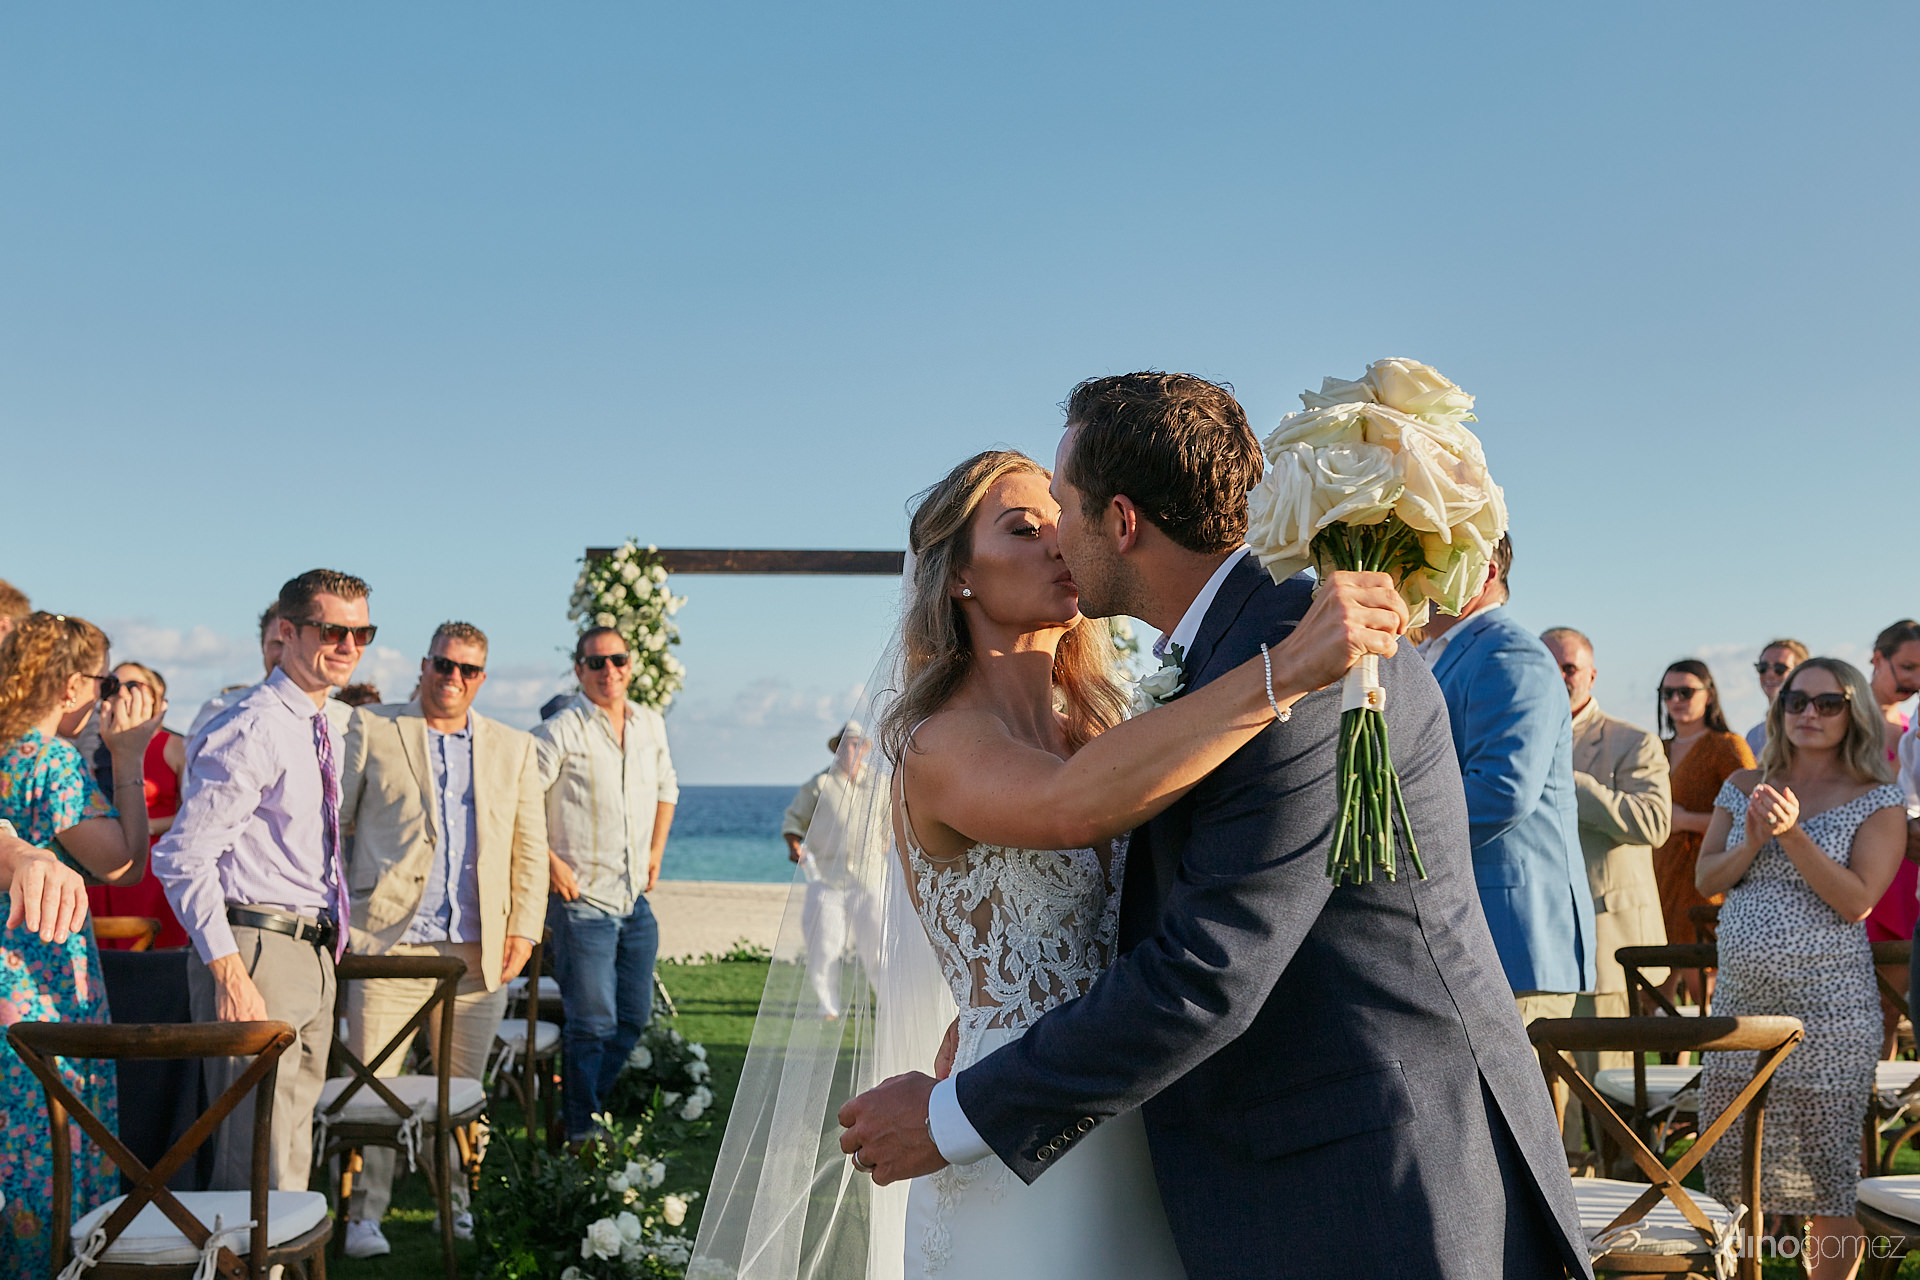 Cabo Wedding Photographers - Luxury Wedding Photographer In Cabo Dino Gomez - C&T